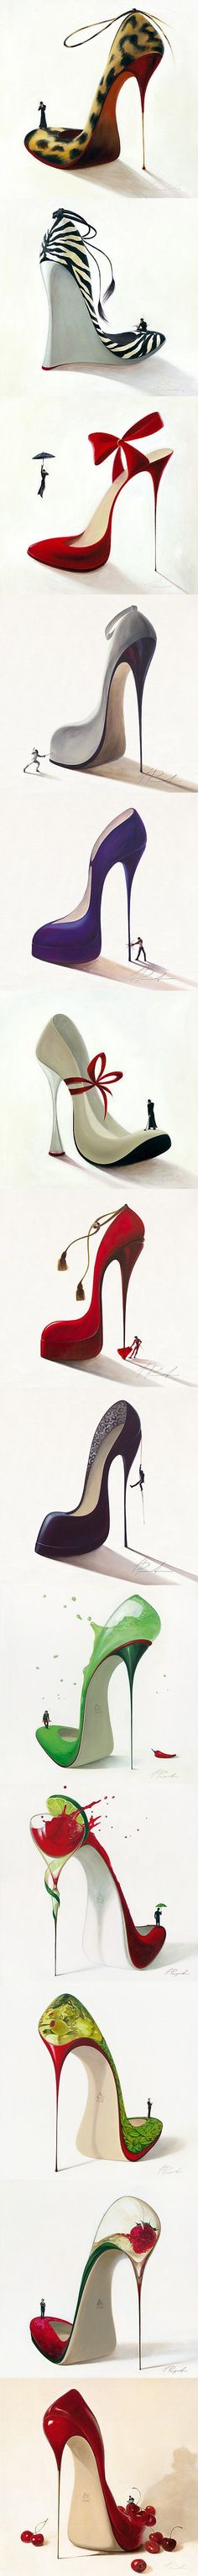 All the beautiful shoe illustrations by Inna Panasenko.